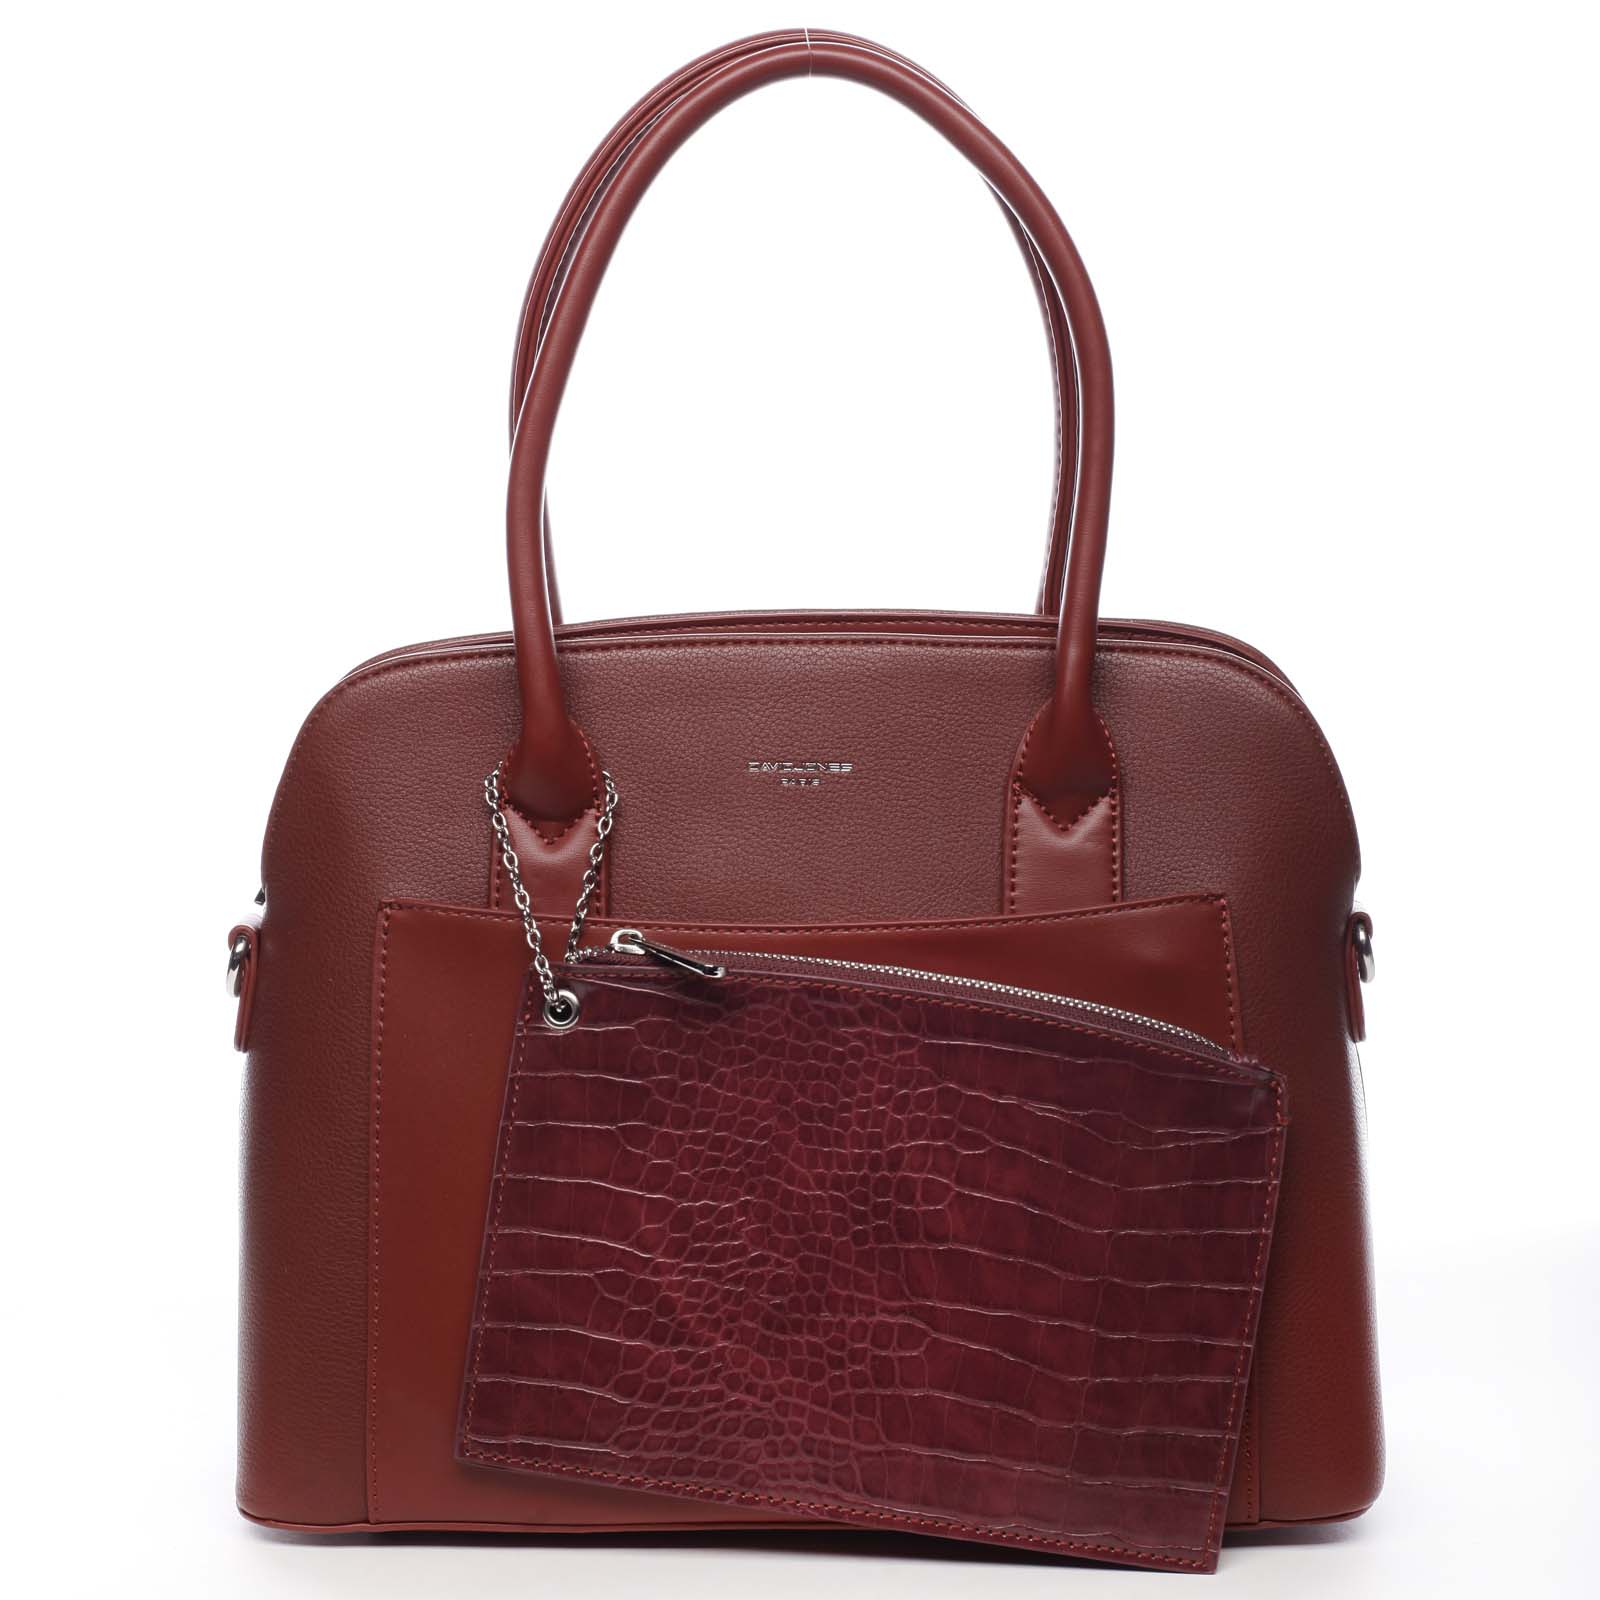 Dámská kabelka tmavě červená - David Jones Caleed